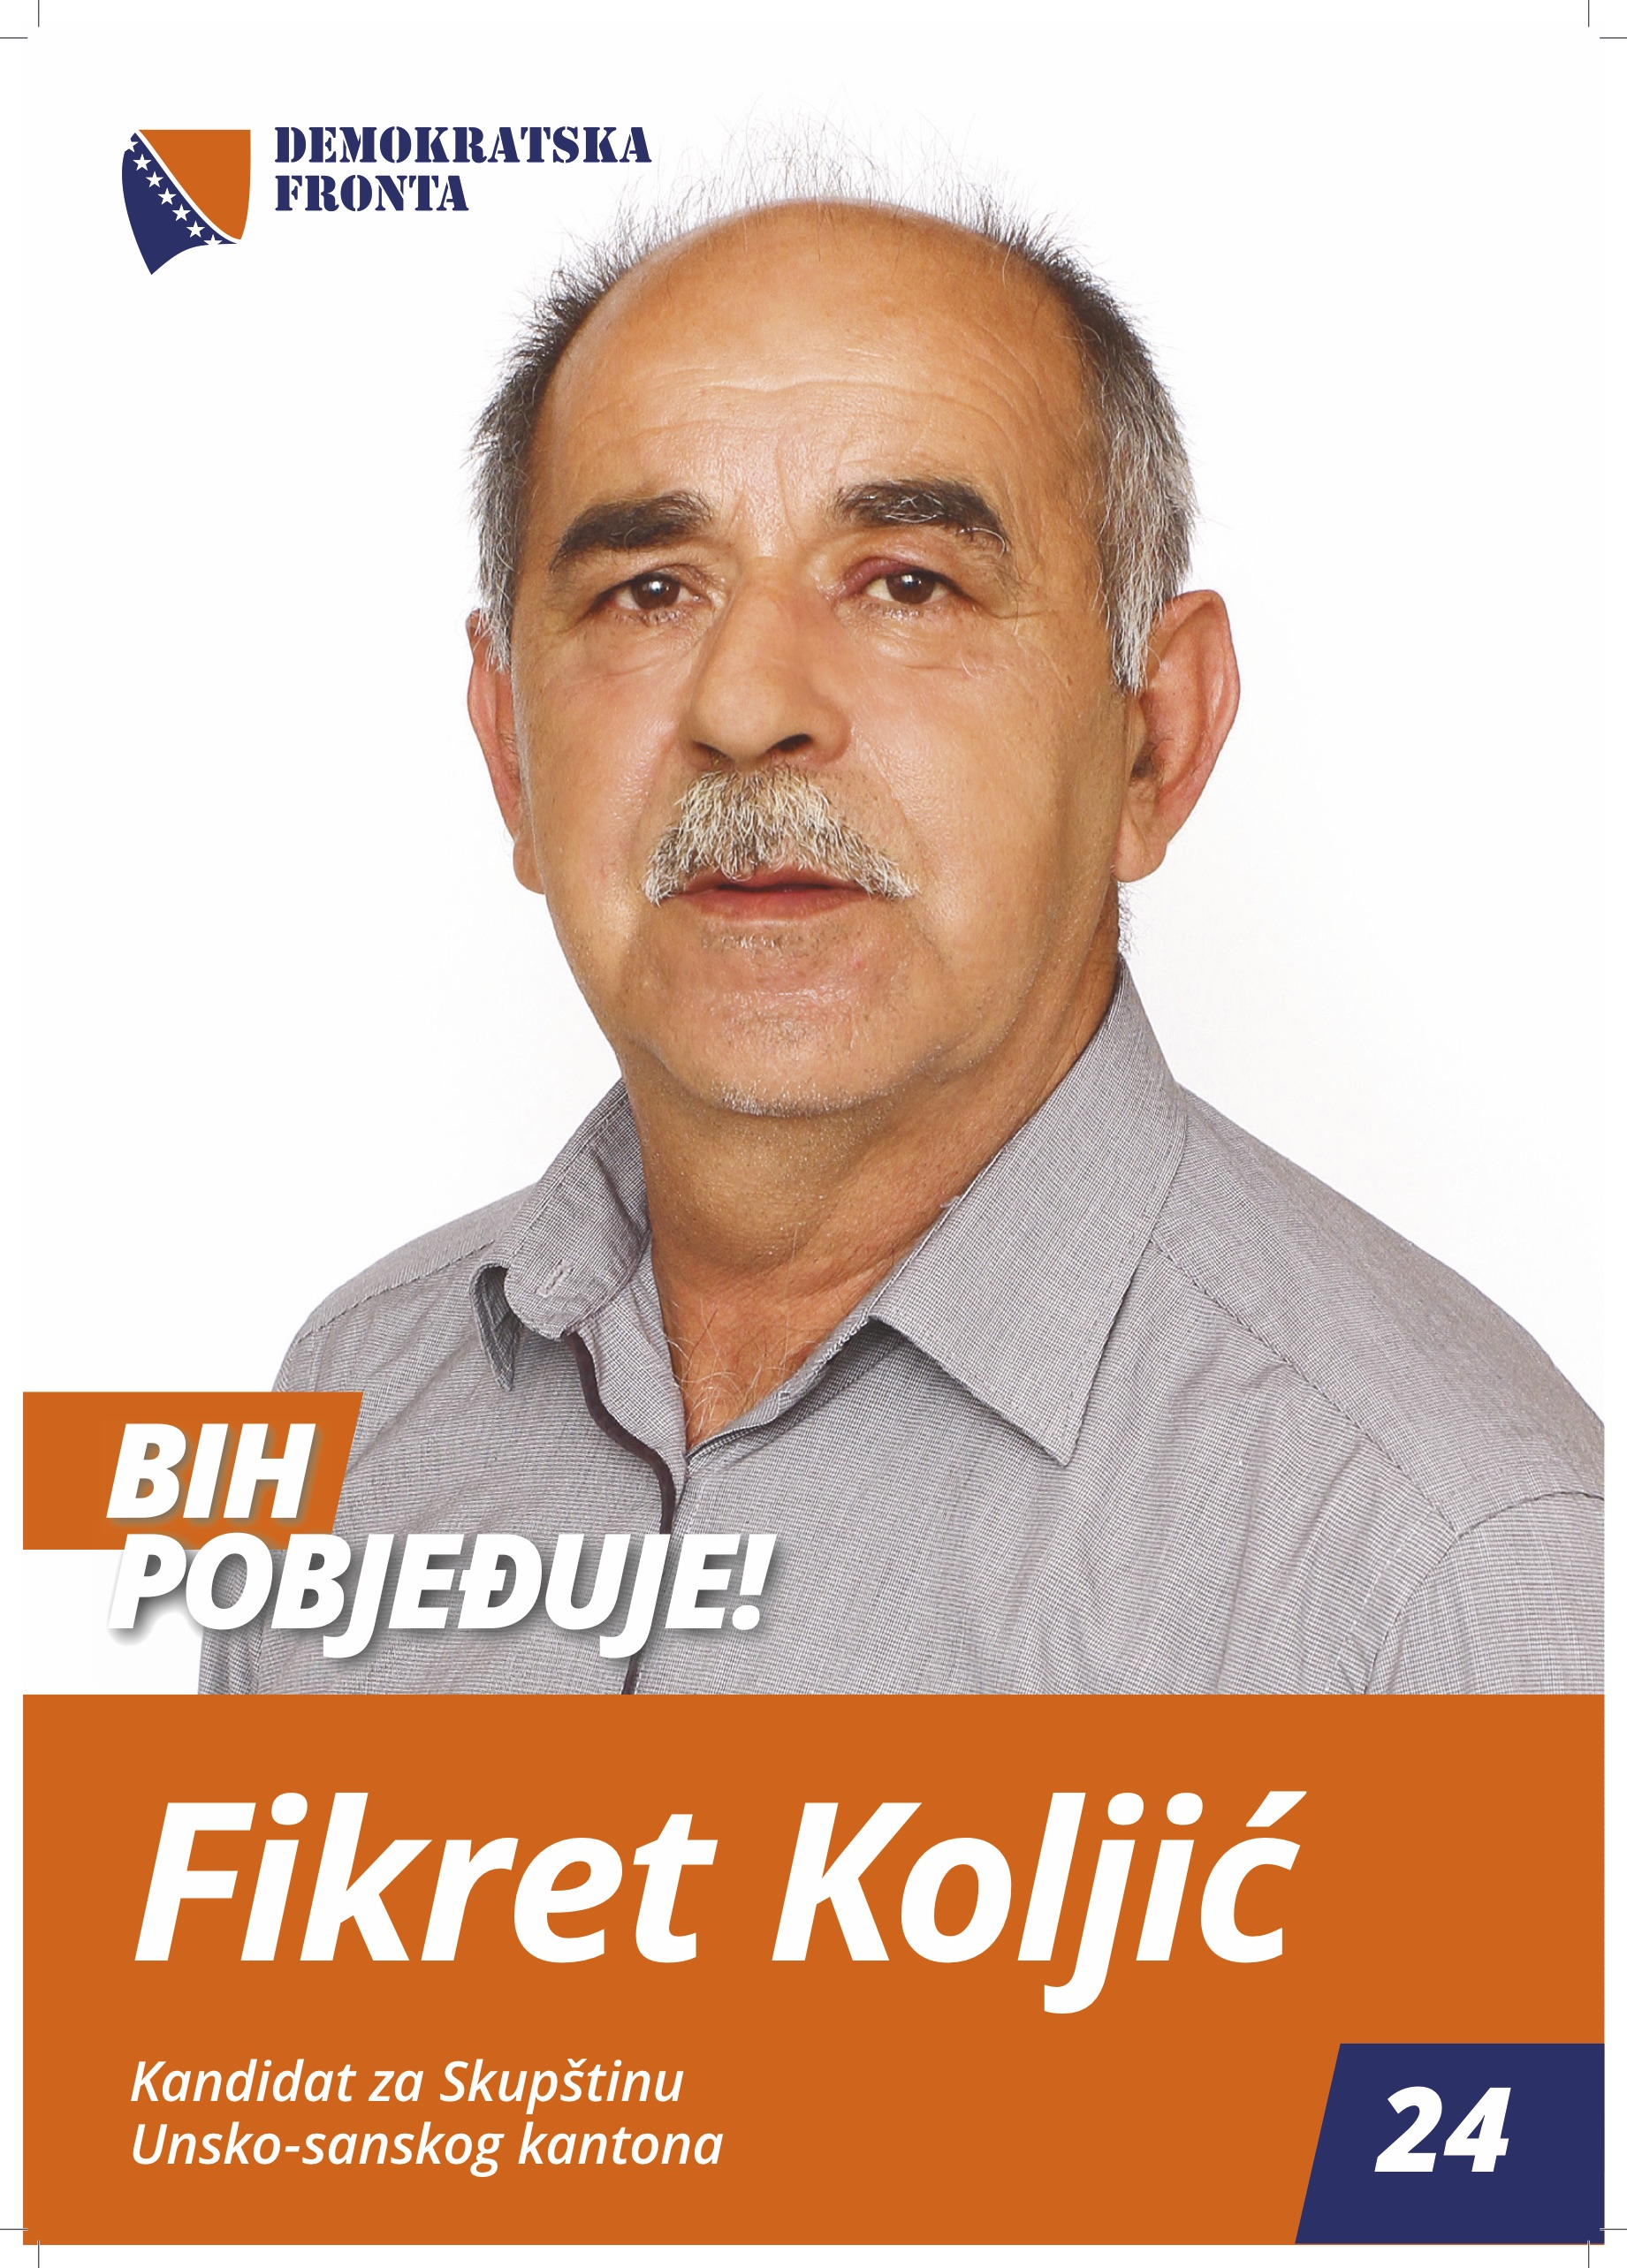 Fikret Koljić, medicinski tehničar